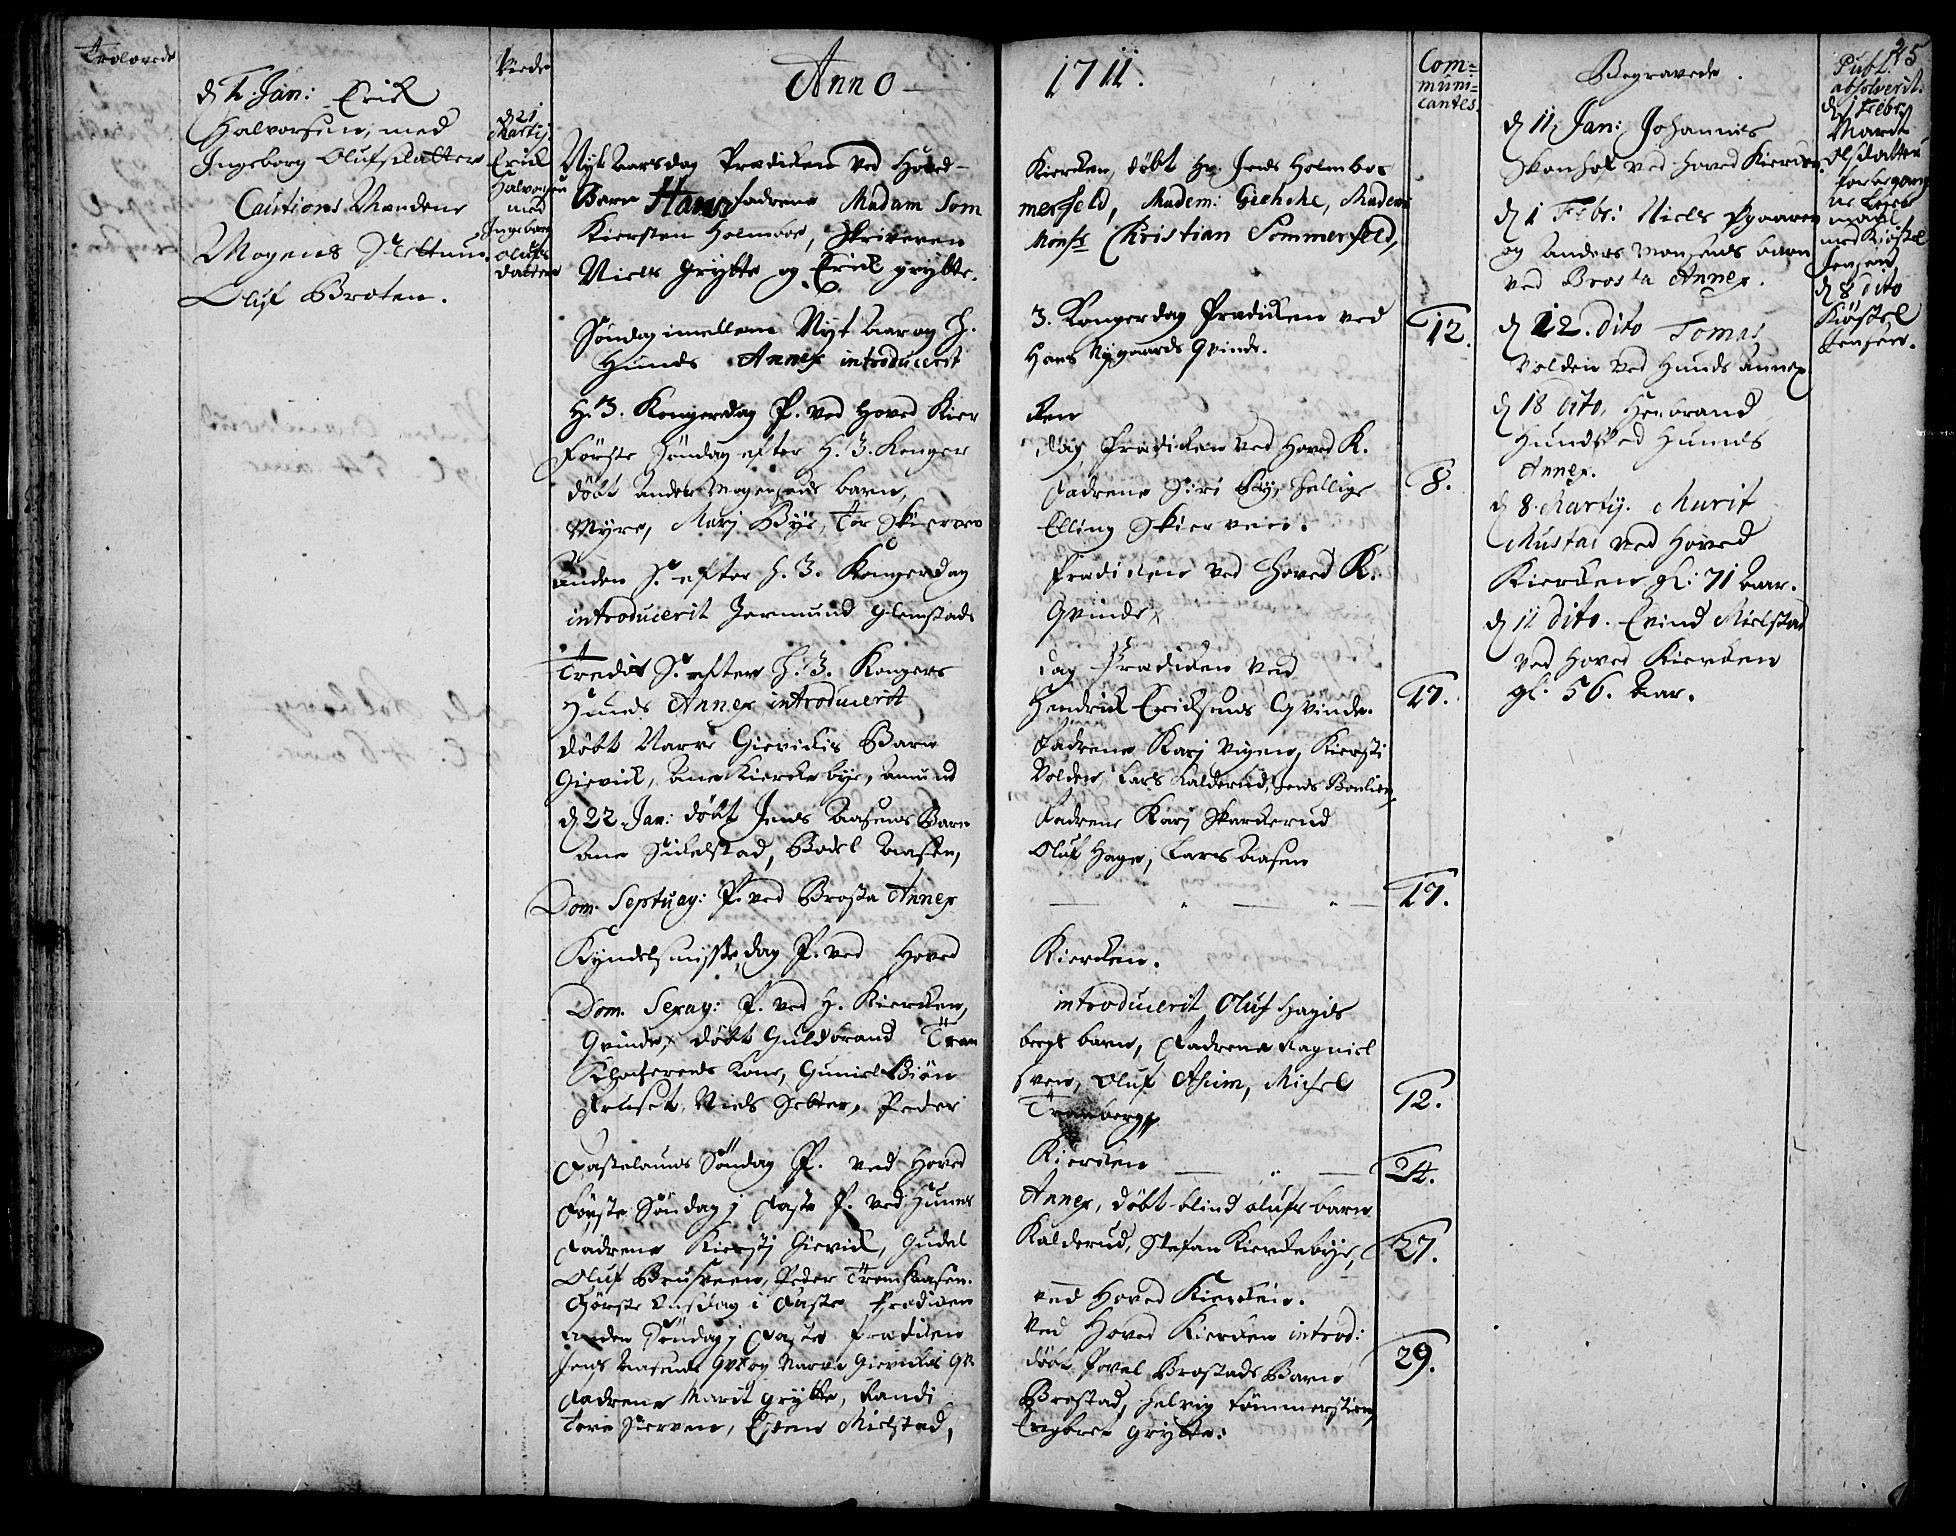 SAH, Vardal prestekontor, H/Ha/Haa/L0001: Ministerialbok nr. 1, 1706-1748, s. 25